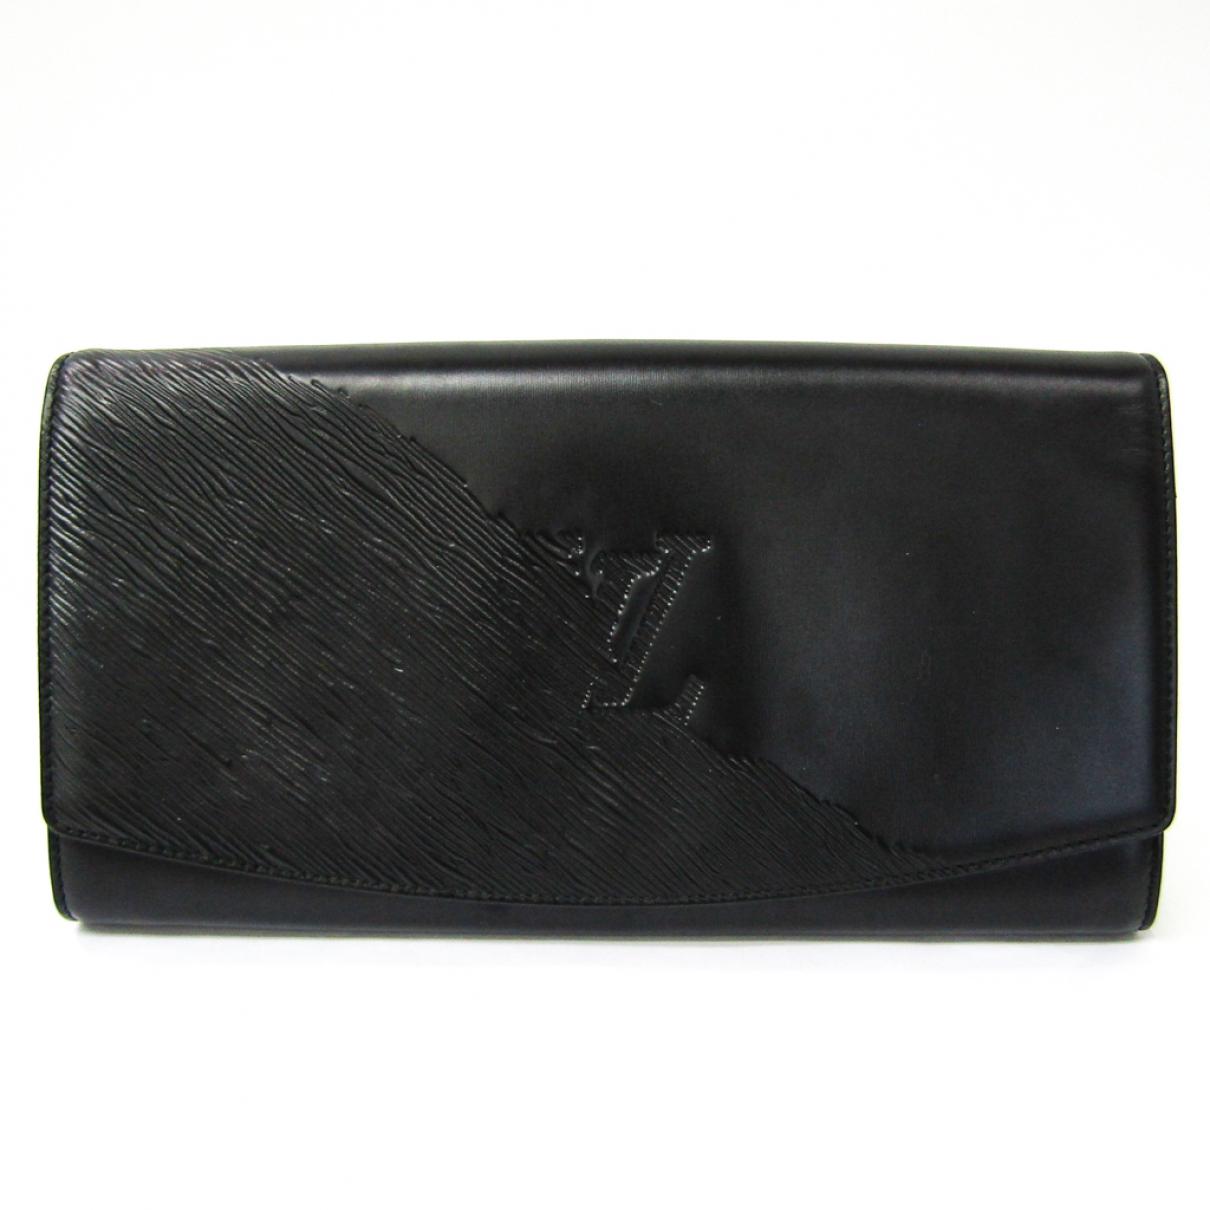 Louis Vuitton N Black Leather Clutch bag for Women N